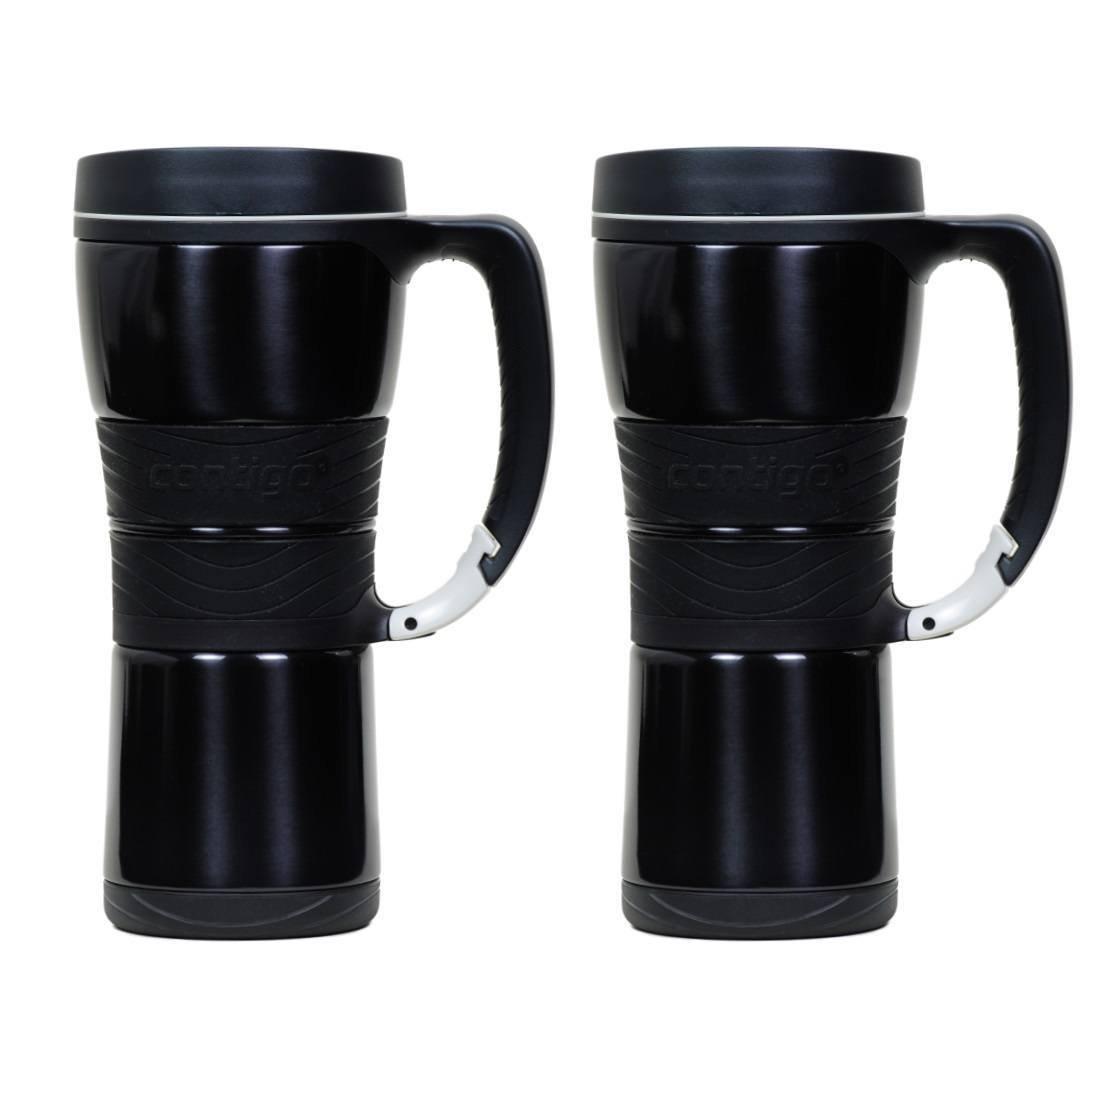 Contigo Extreme Stainless Steel Travel Mug with Handle, 16oz - Metallic Black (2 Pack)